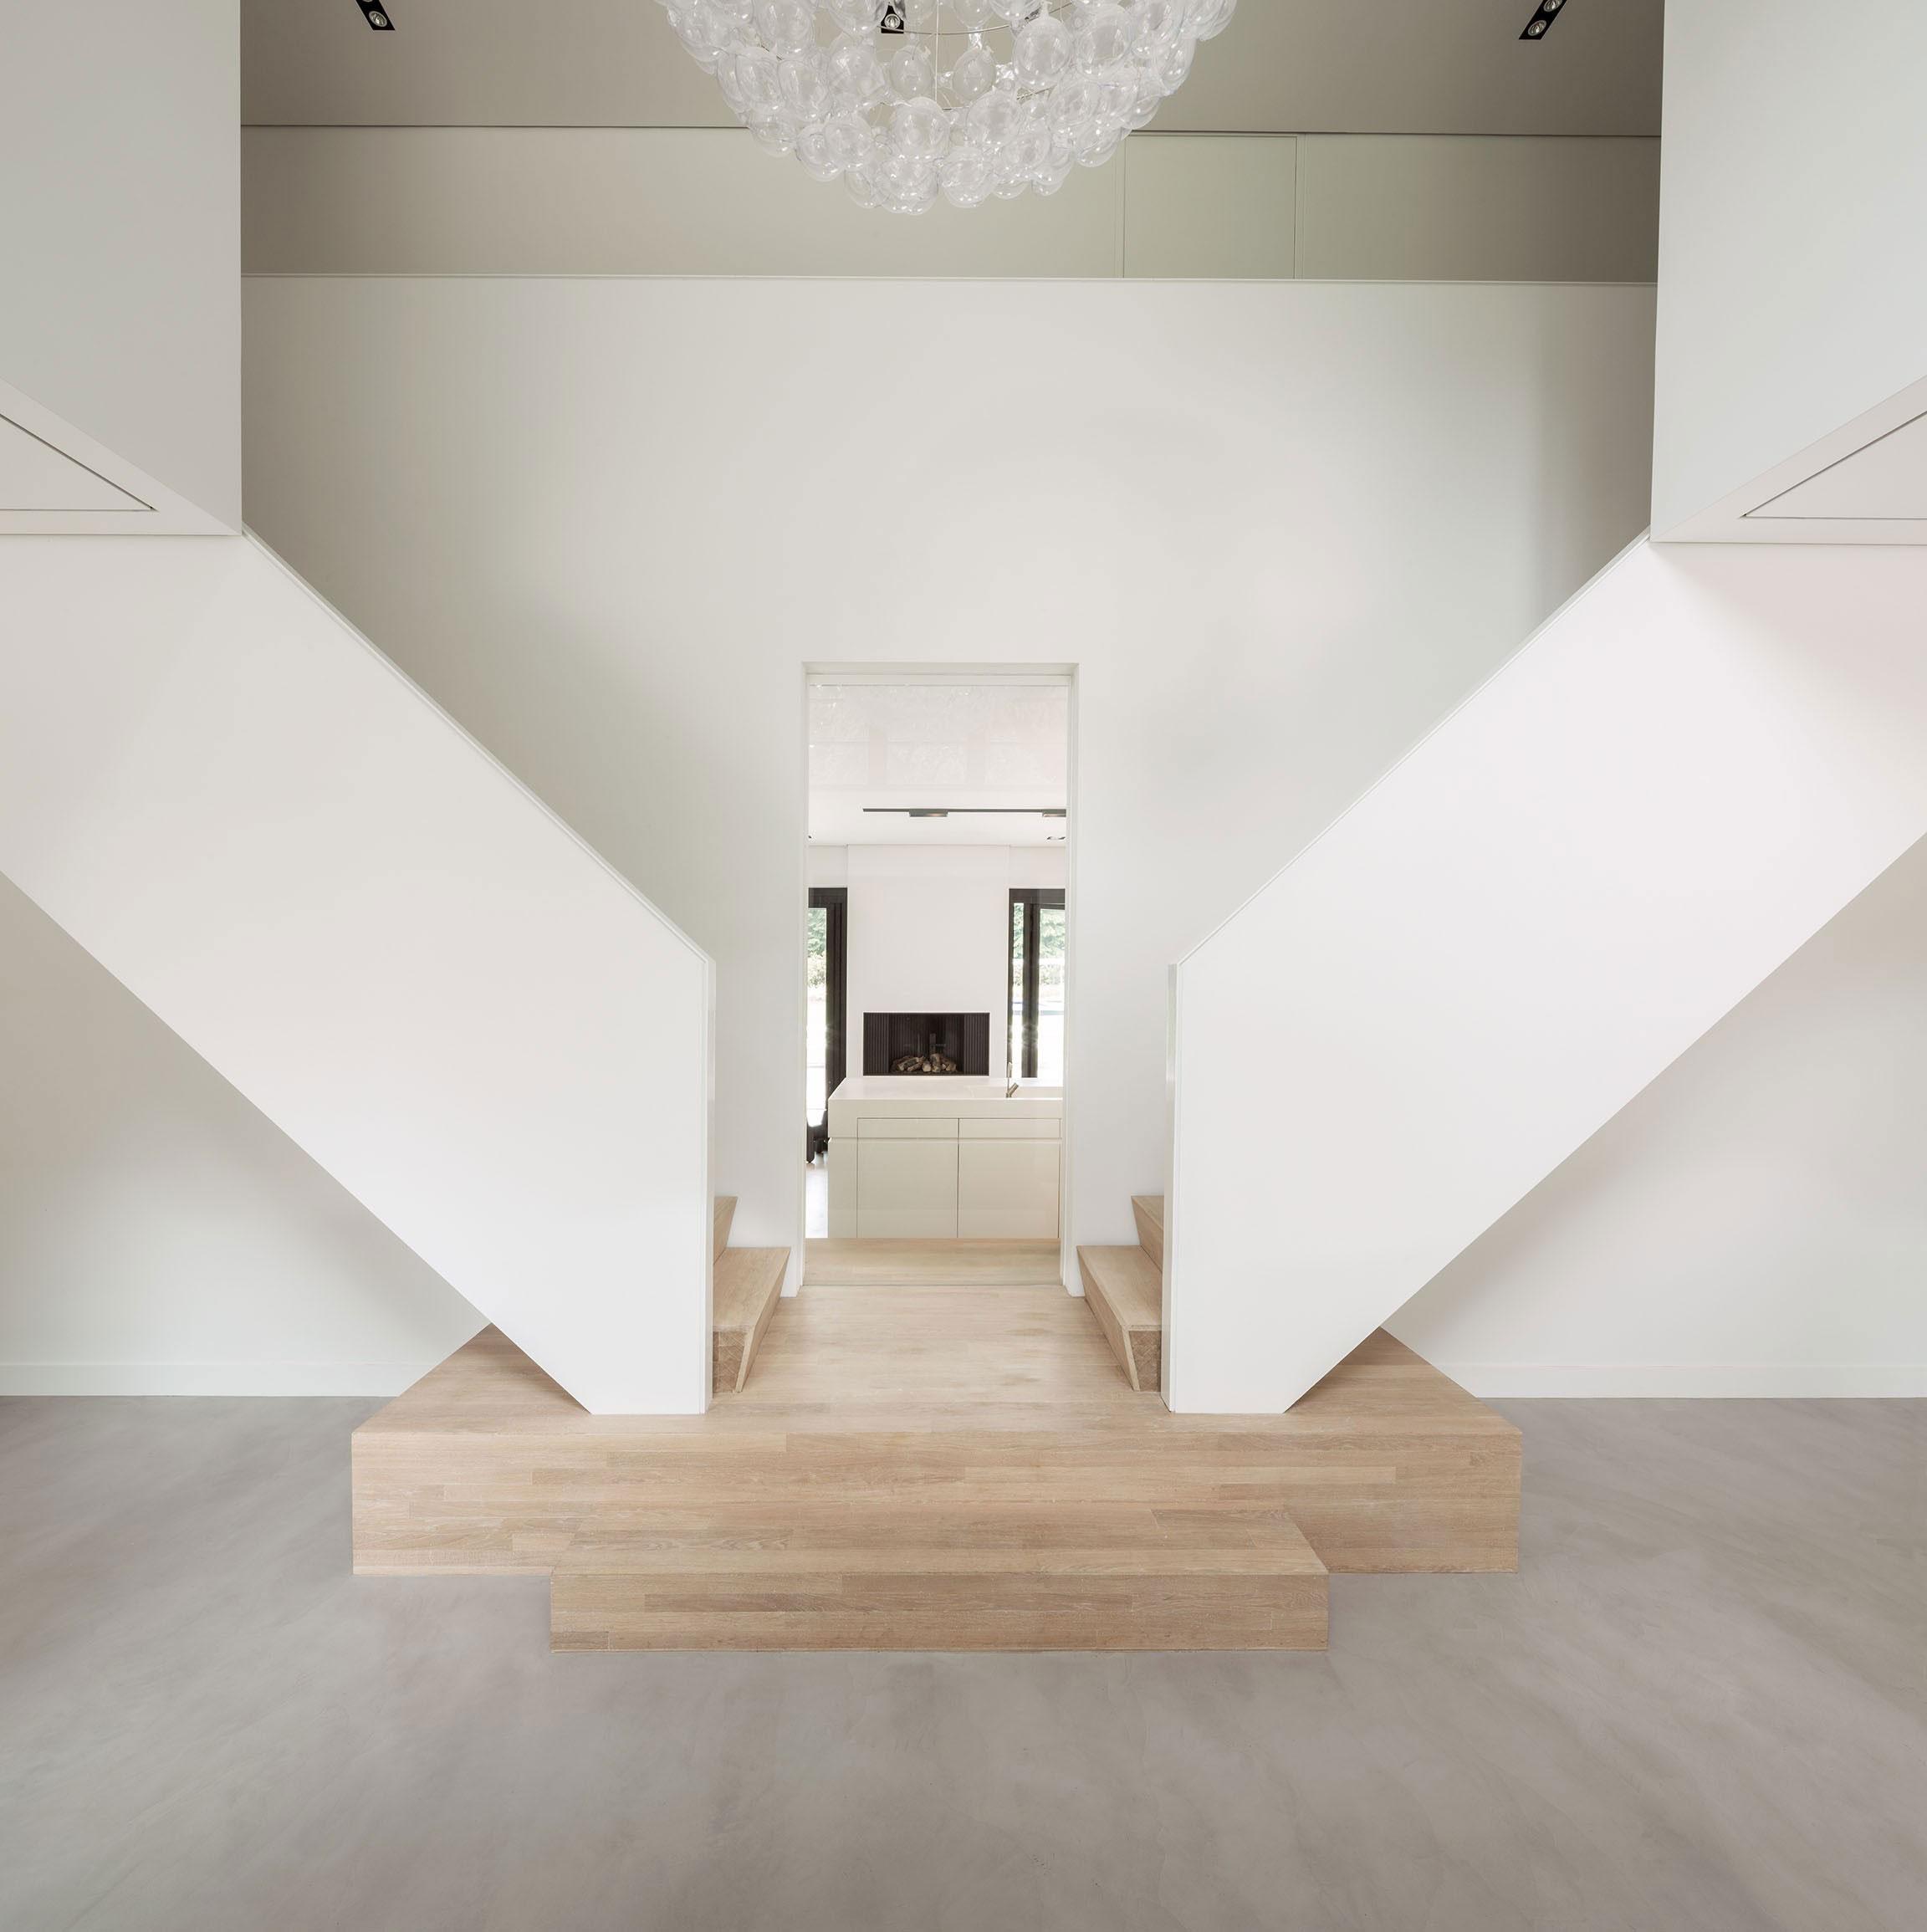 Modern Huizen Country House Located in a Quiet Rural Setting by De Brouwer Binnenwerk-14